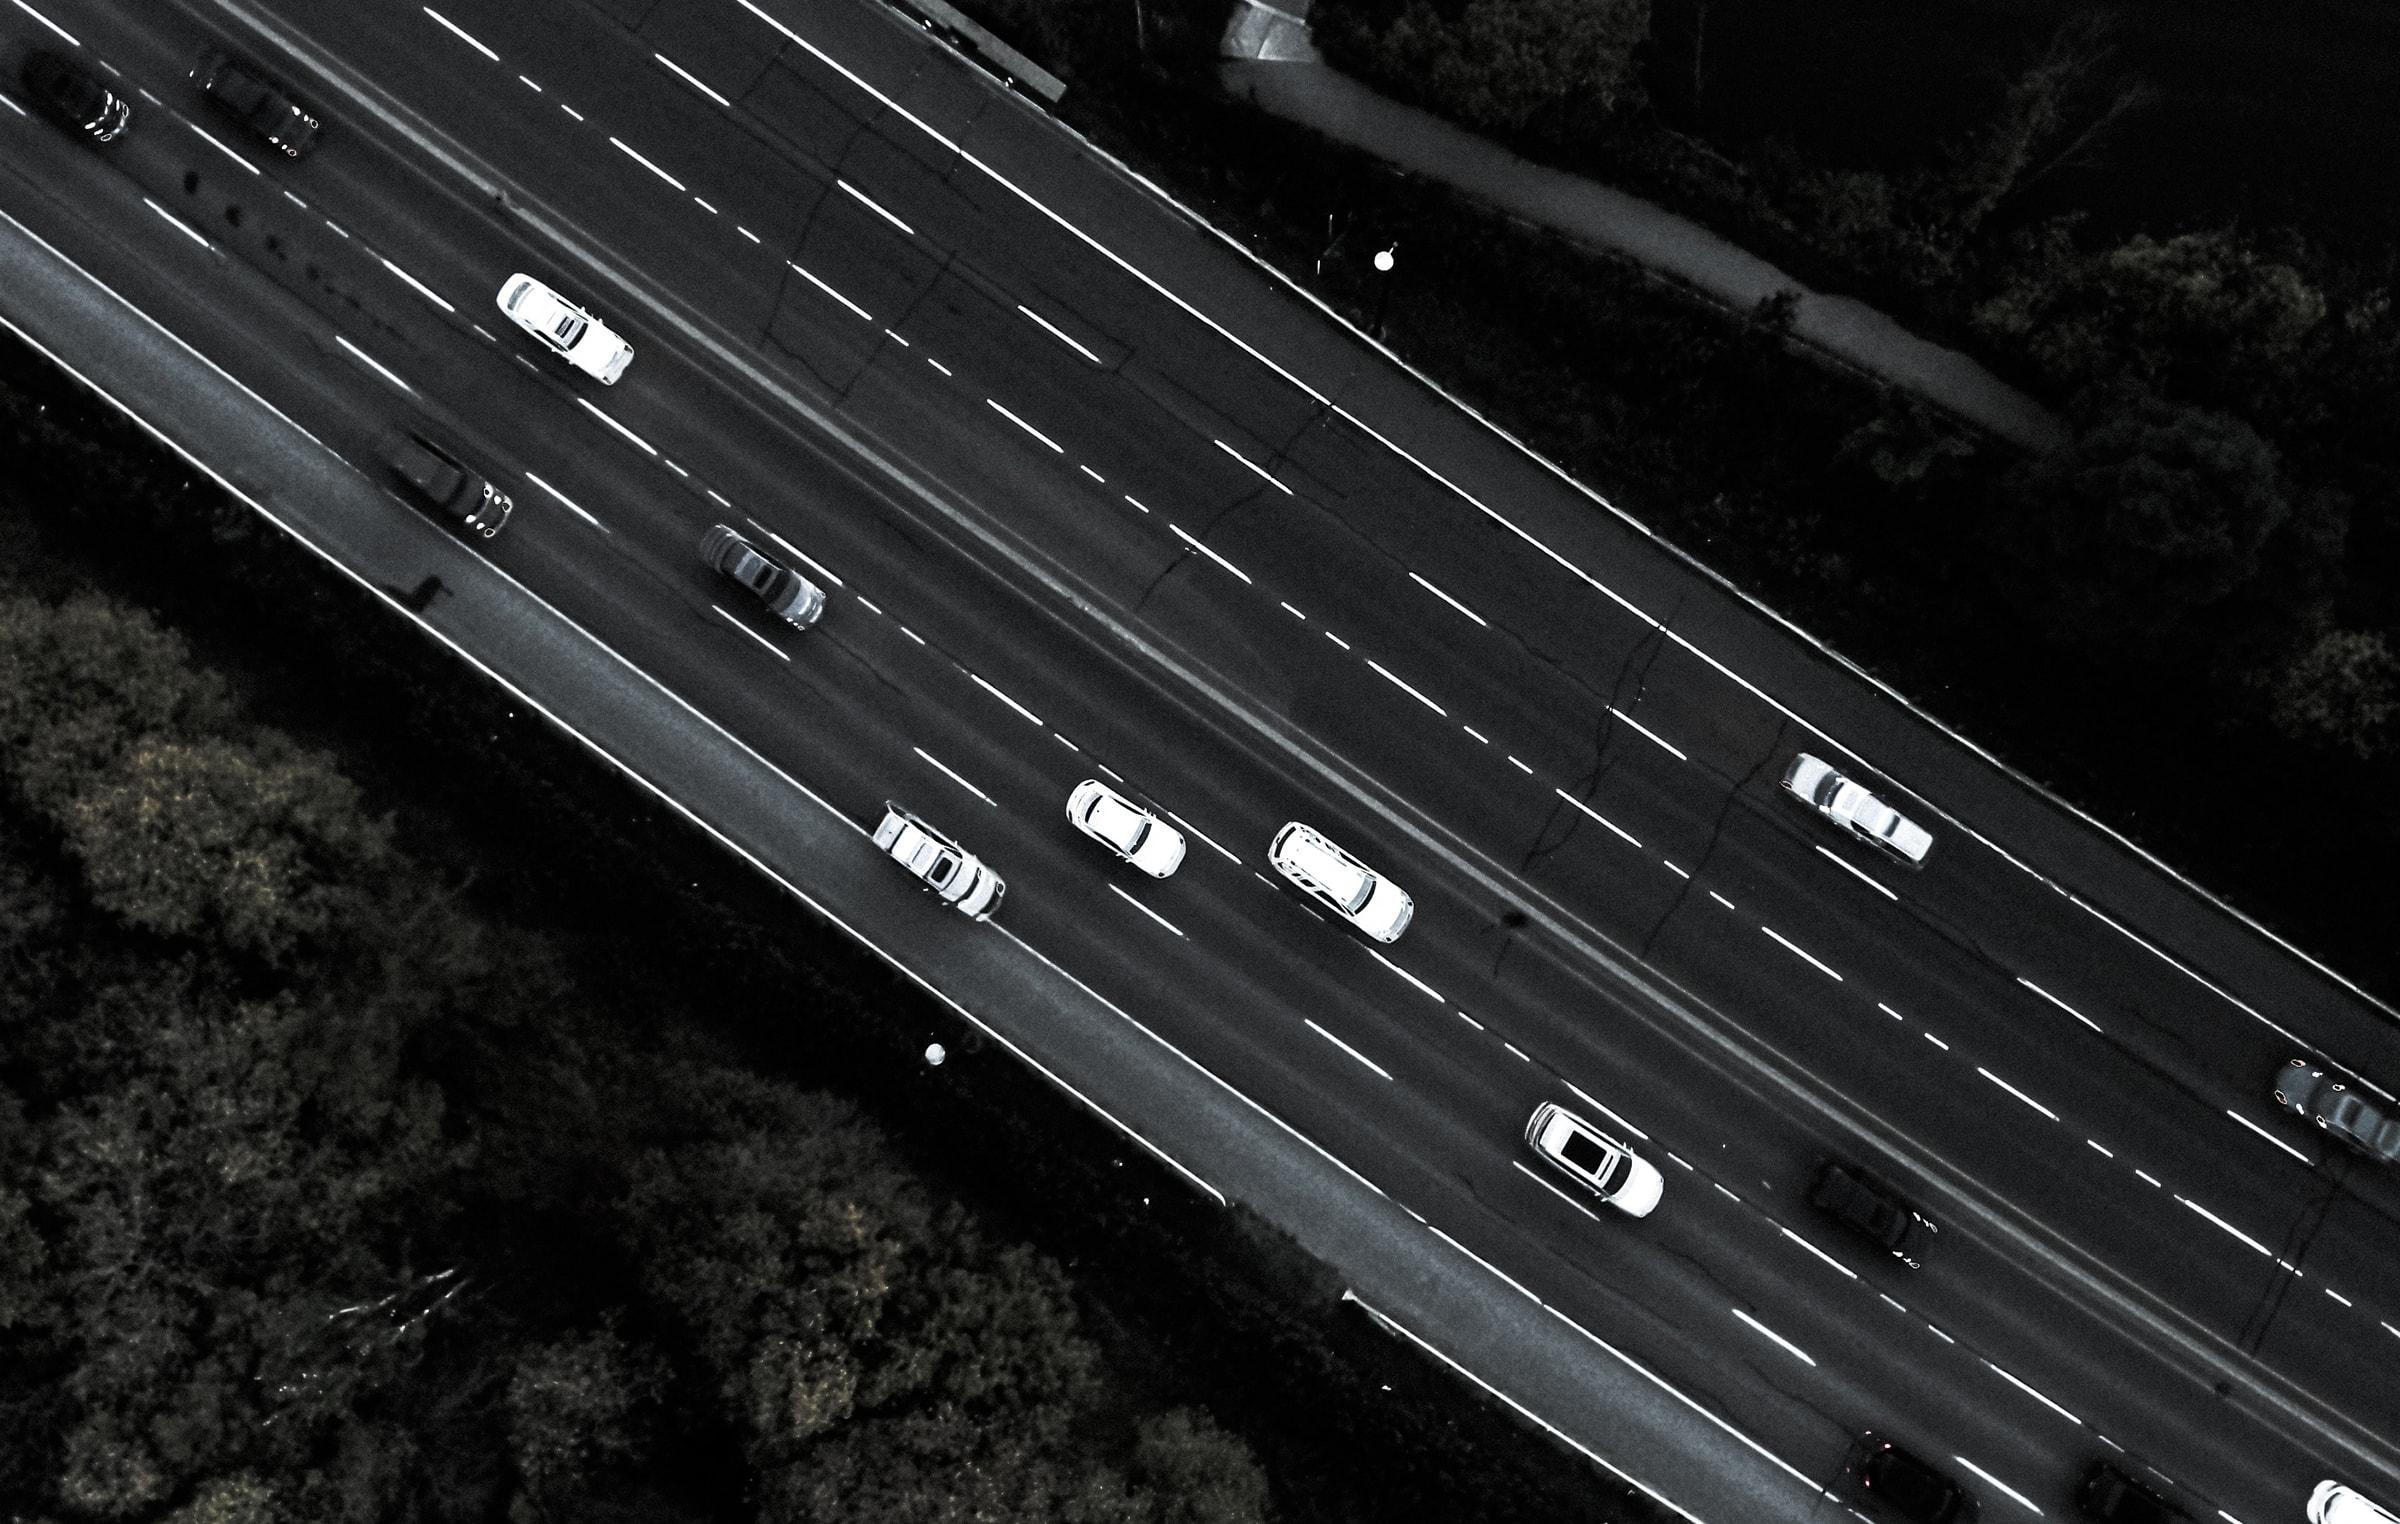 Ontario Report on Auto Insurance Lacking - Thumbnail